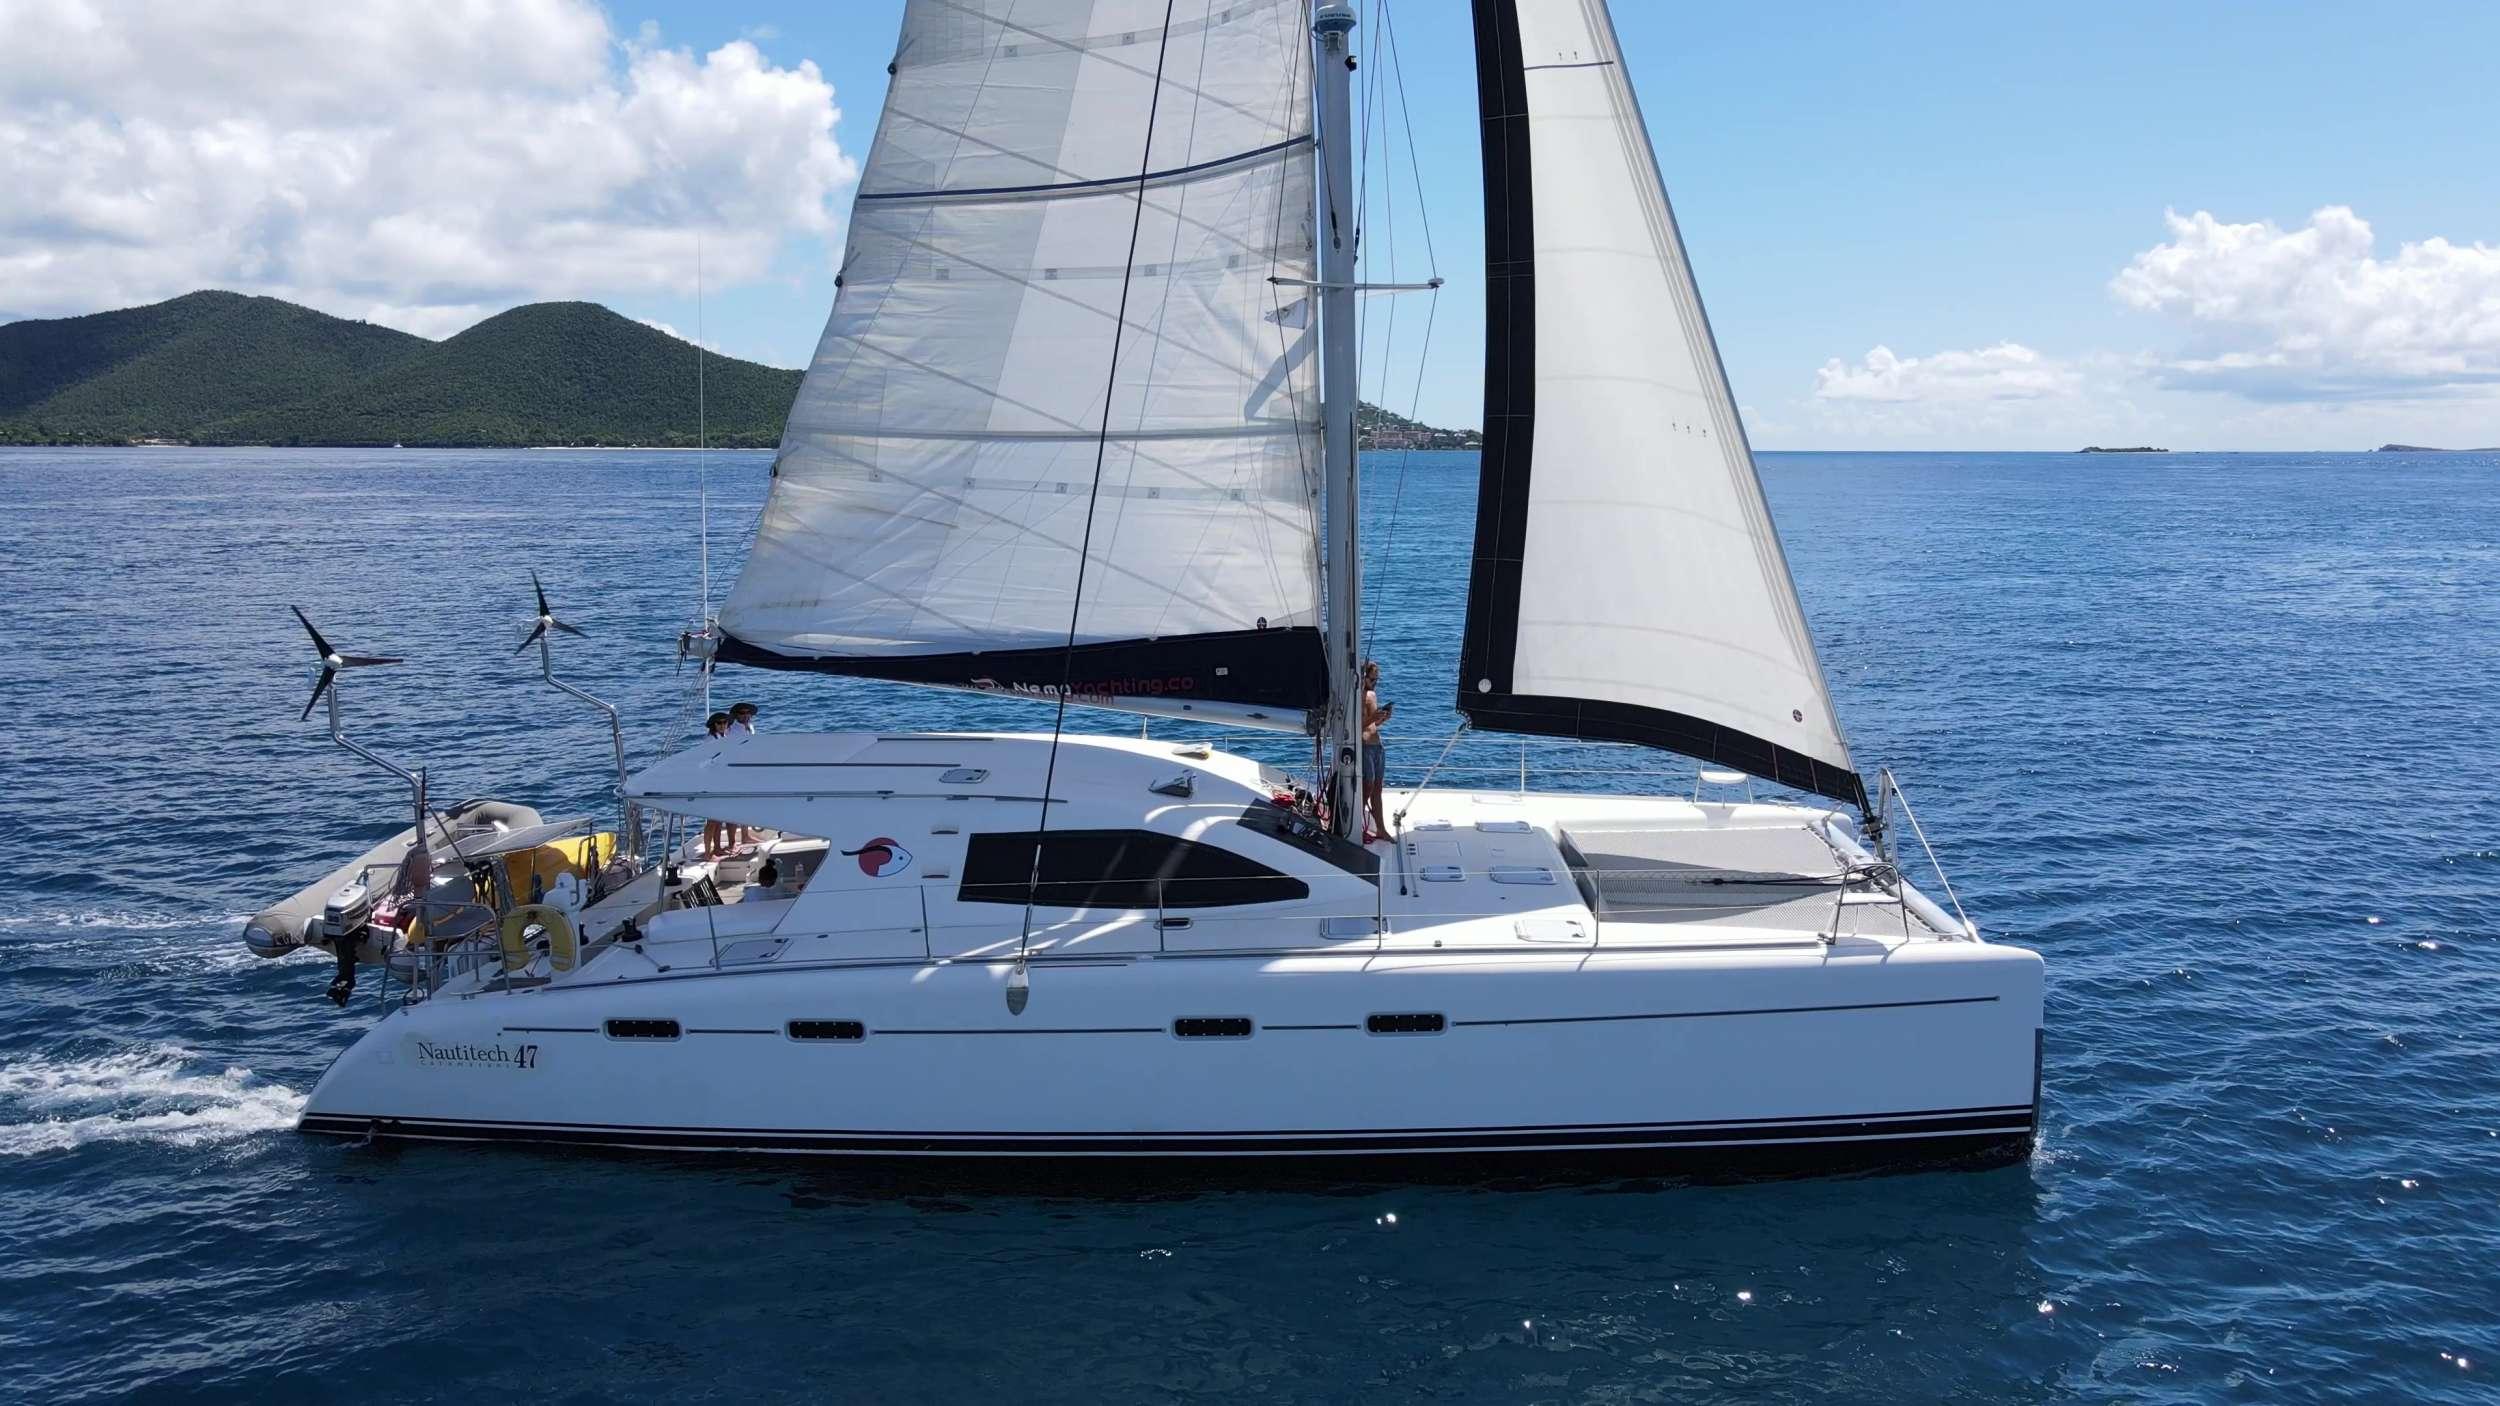 Great sailing shot of NEMO!